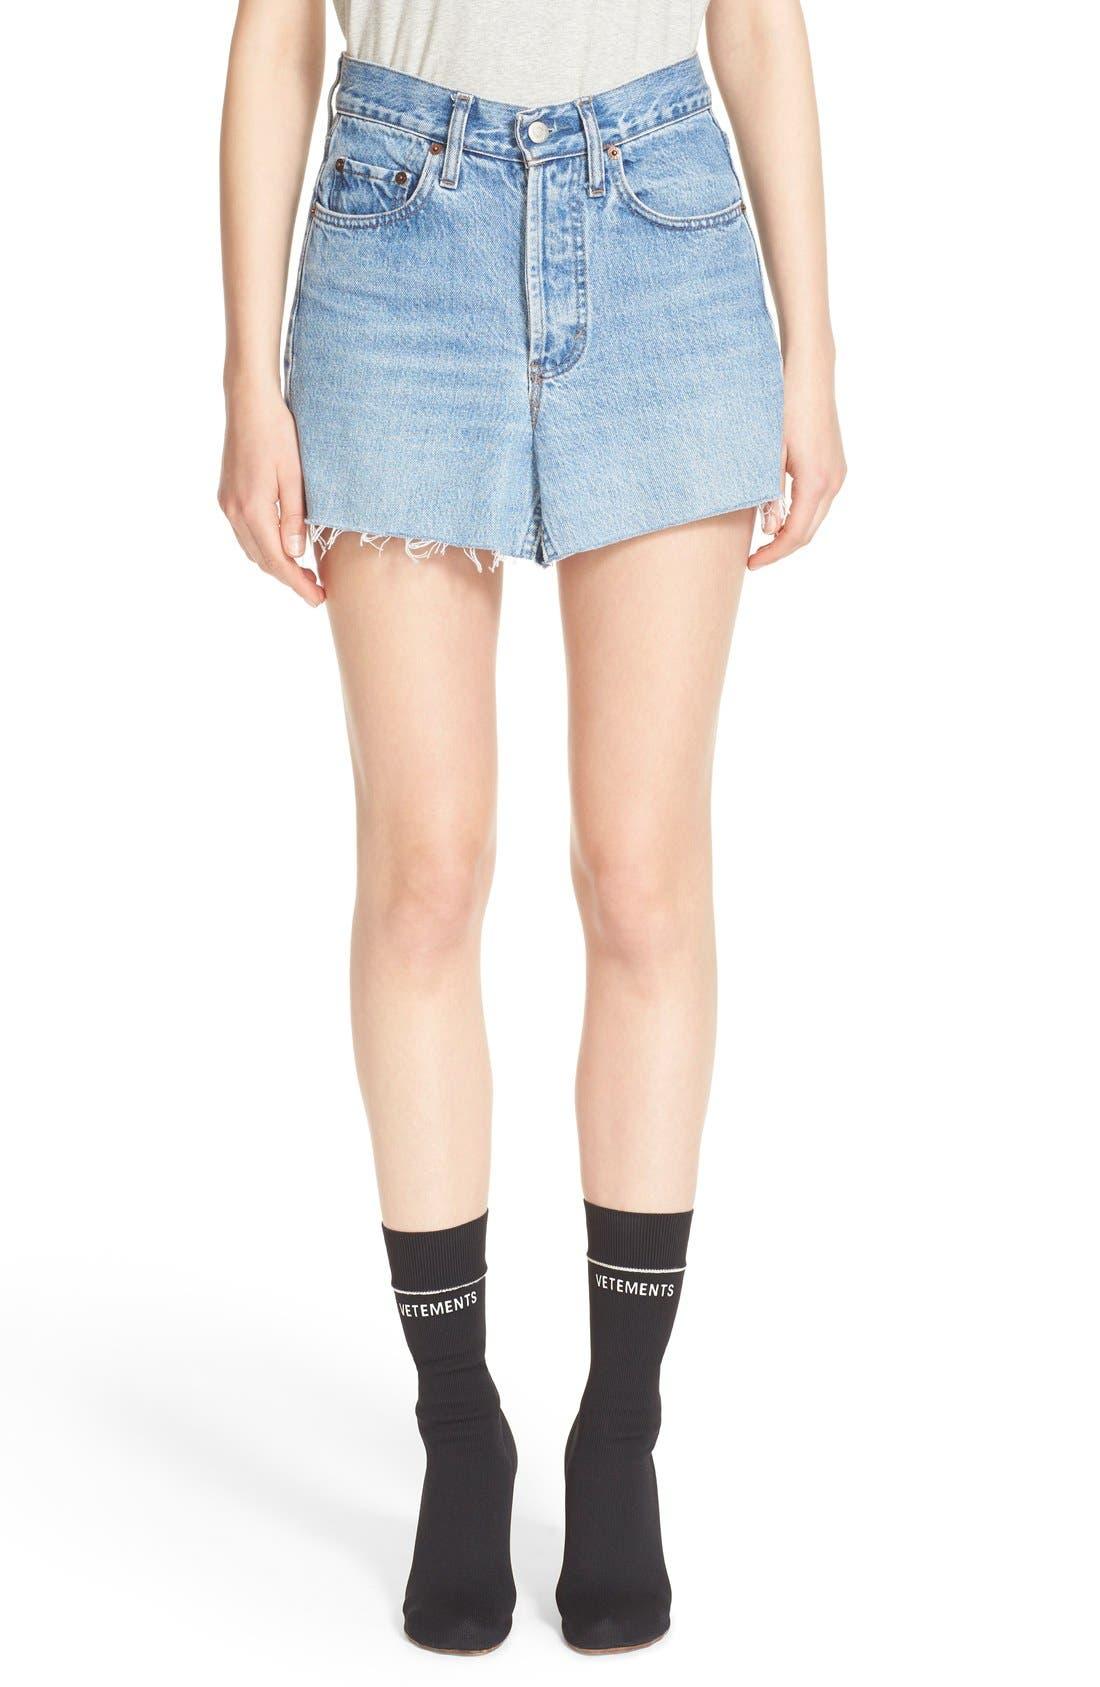 Alternate Image 1 Selected - Vetements Denim Mini Skirt